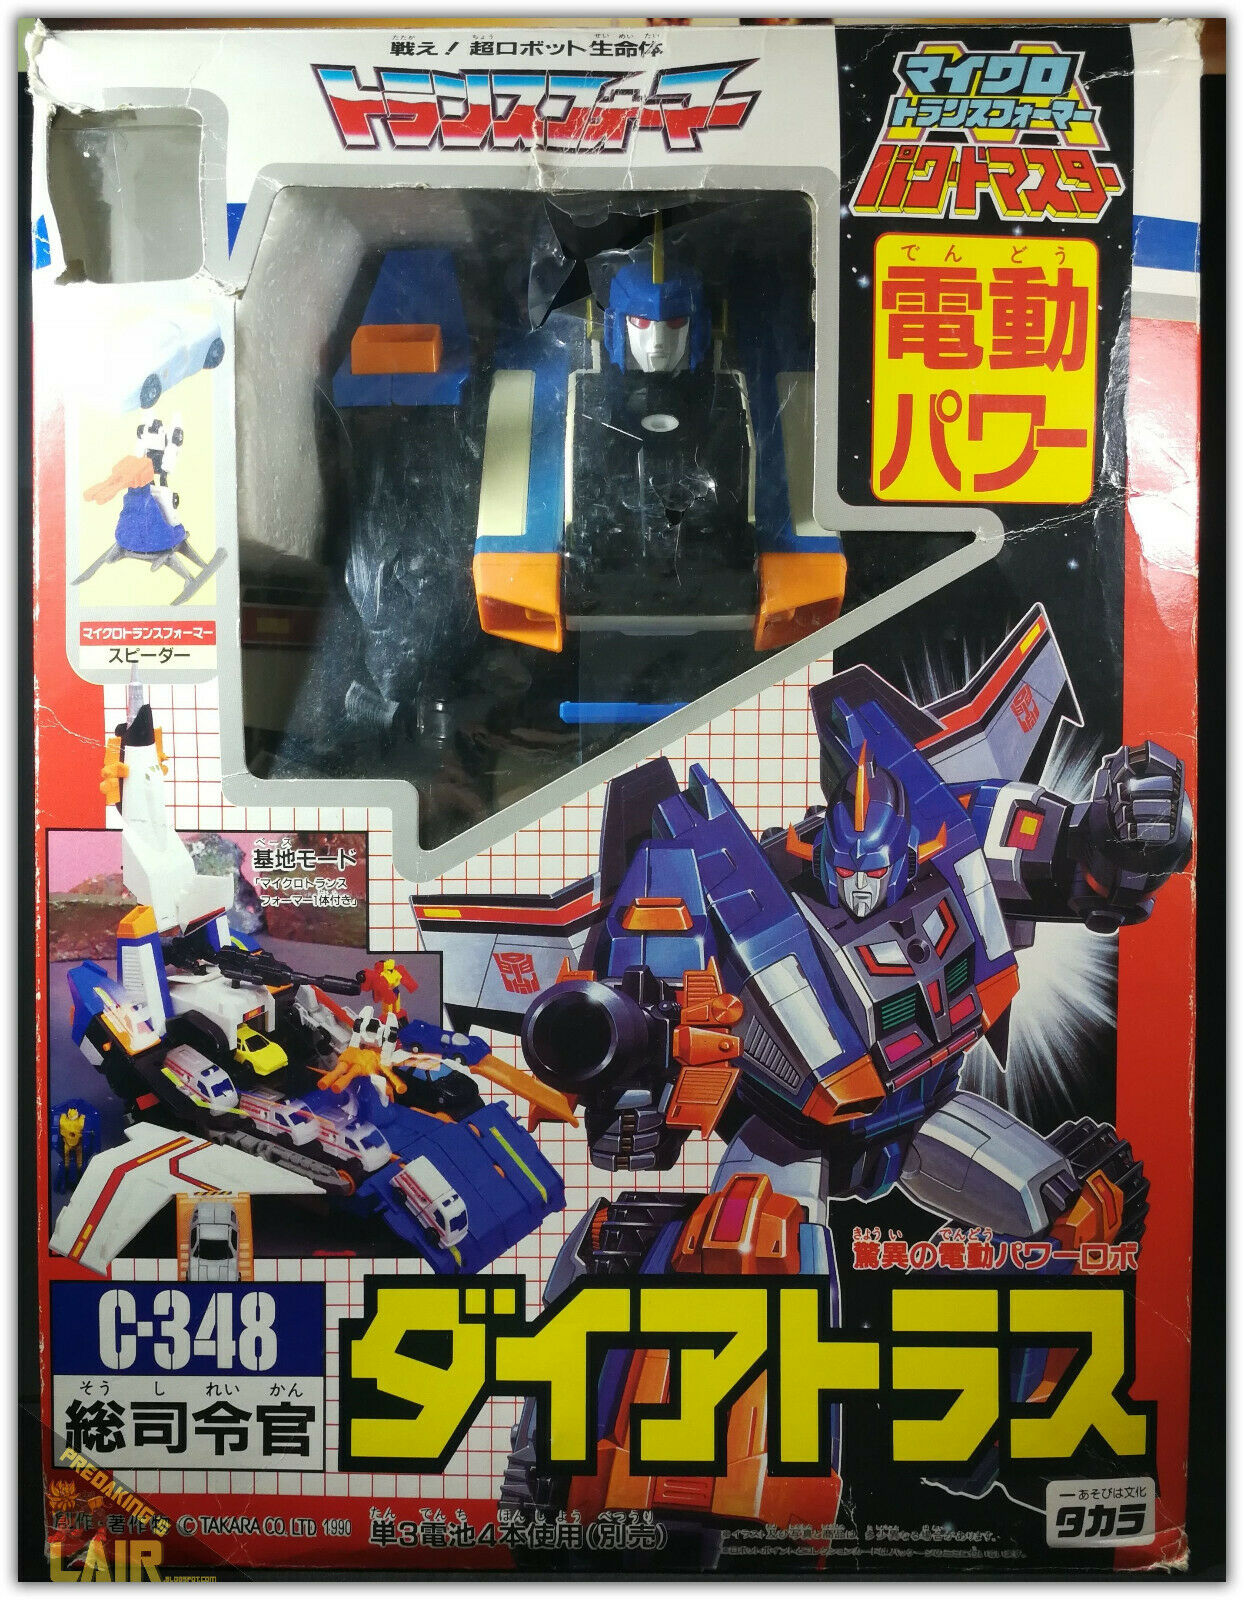 apresurado a ver Transformers G1 Takara C-348 Zone Dai Dai Dai Atlas ORIGINAL NEAR COMPLETE MIB  marca de lujo